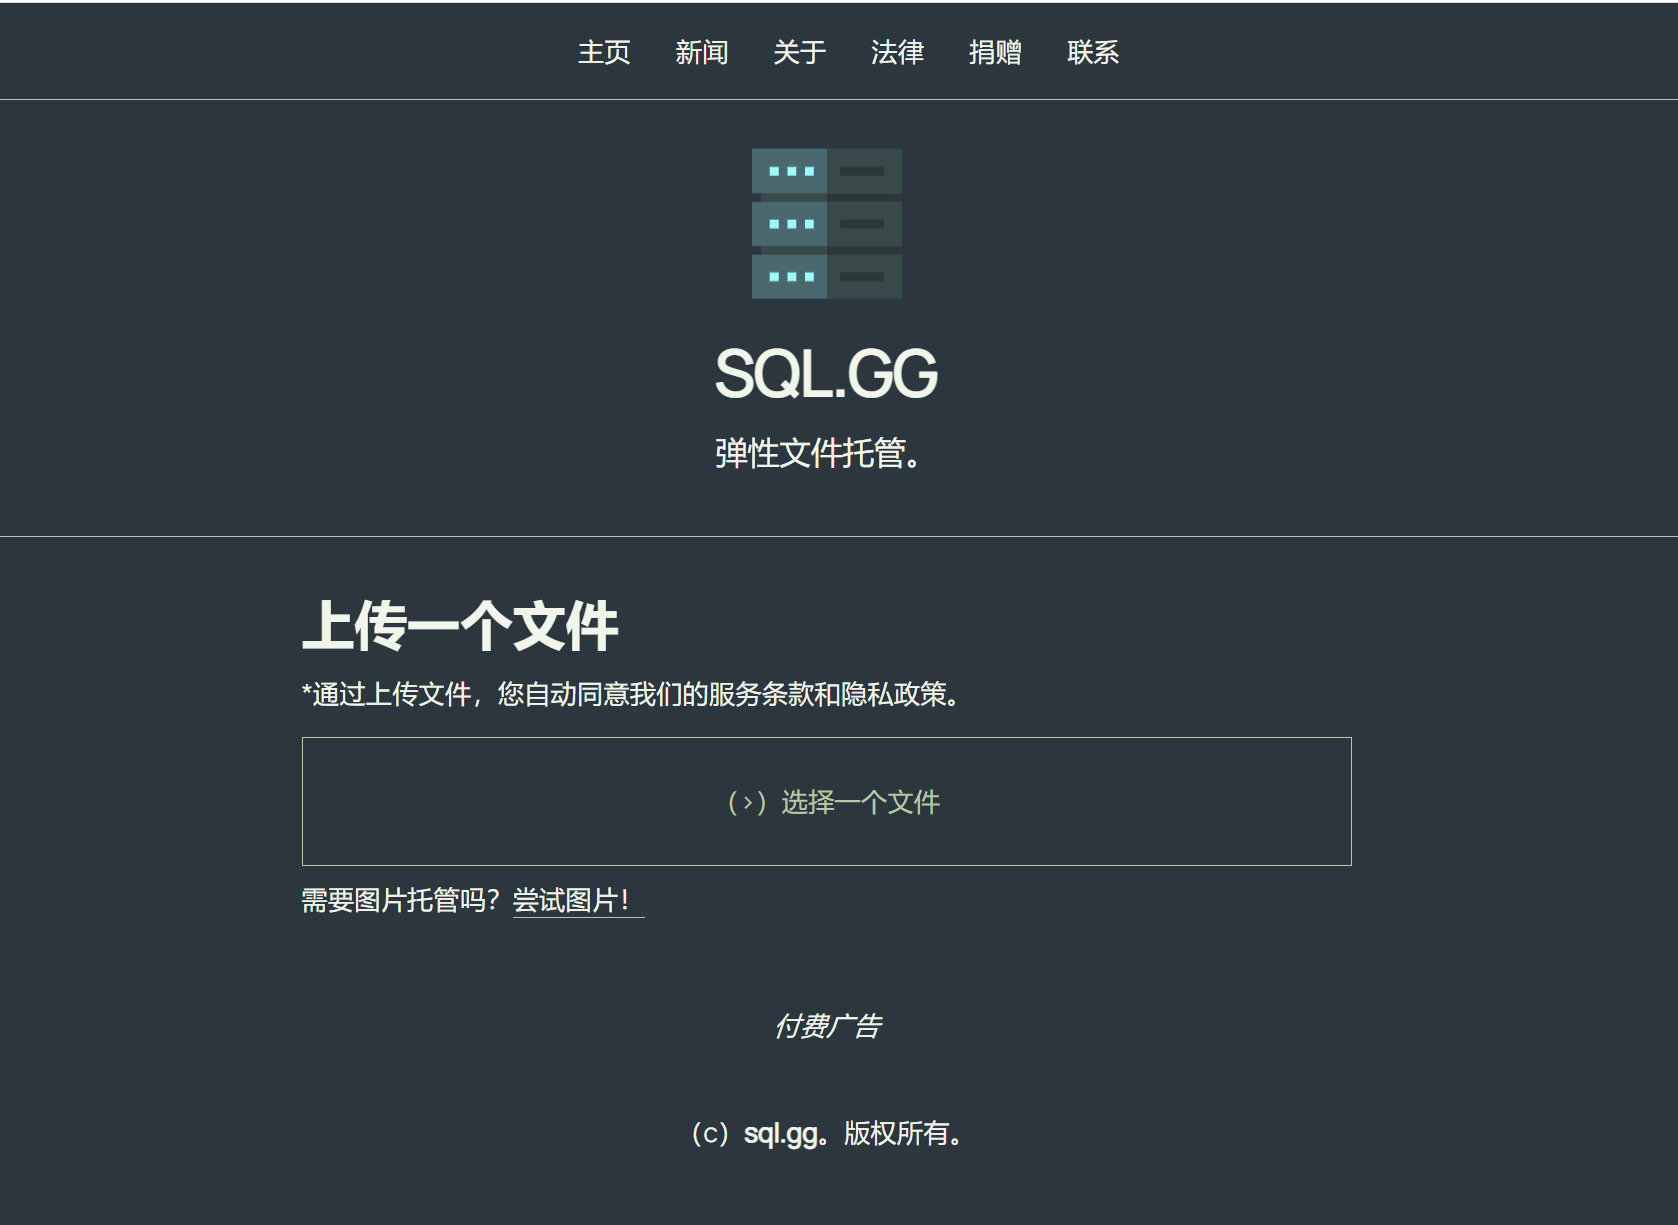 SQL.GG网盘,弹性文件托管,一个匿名的小众网盘